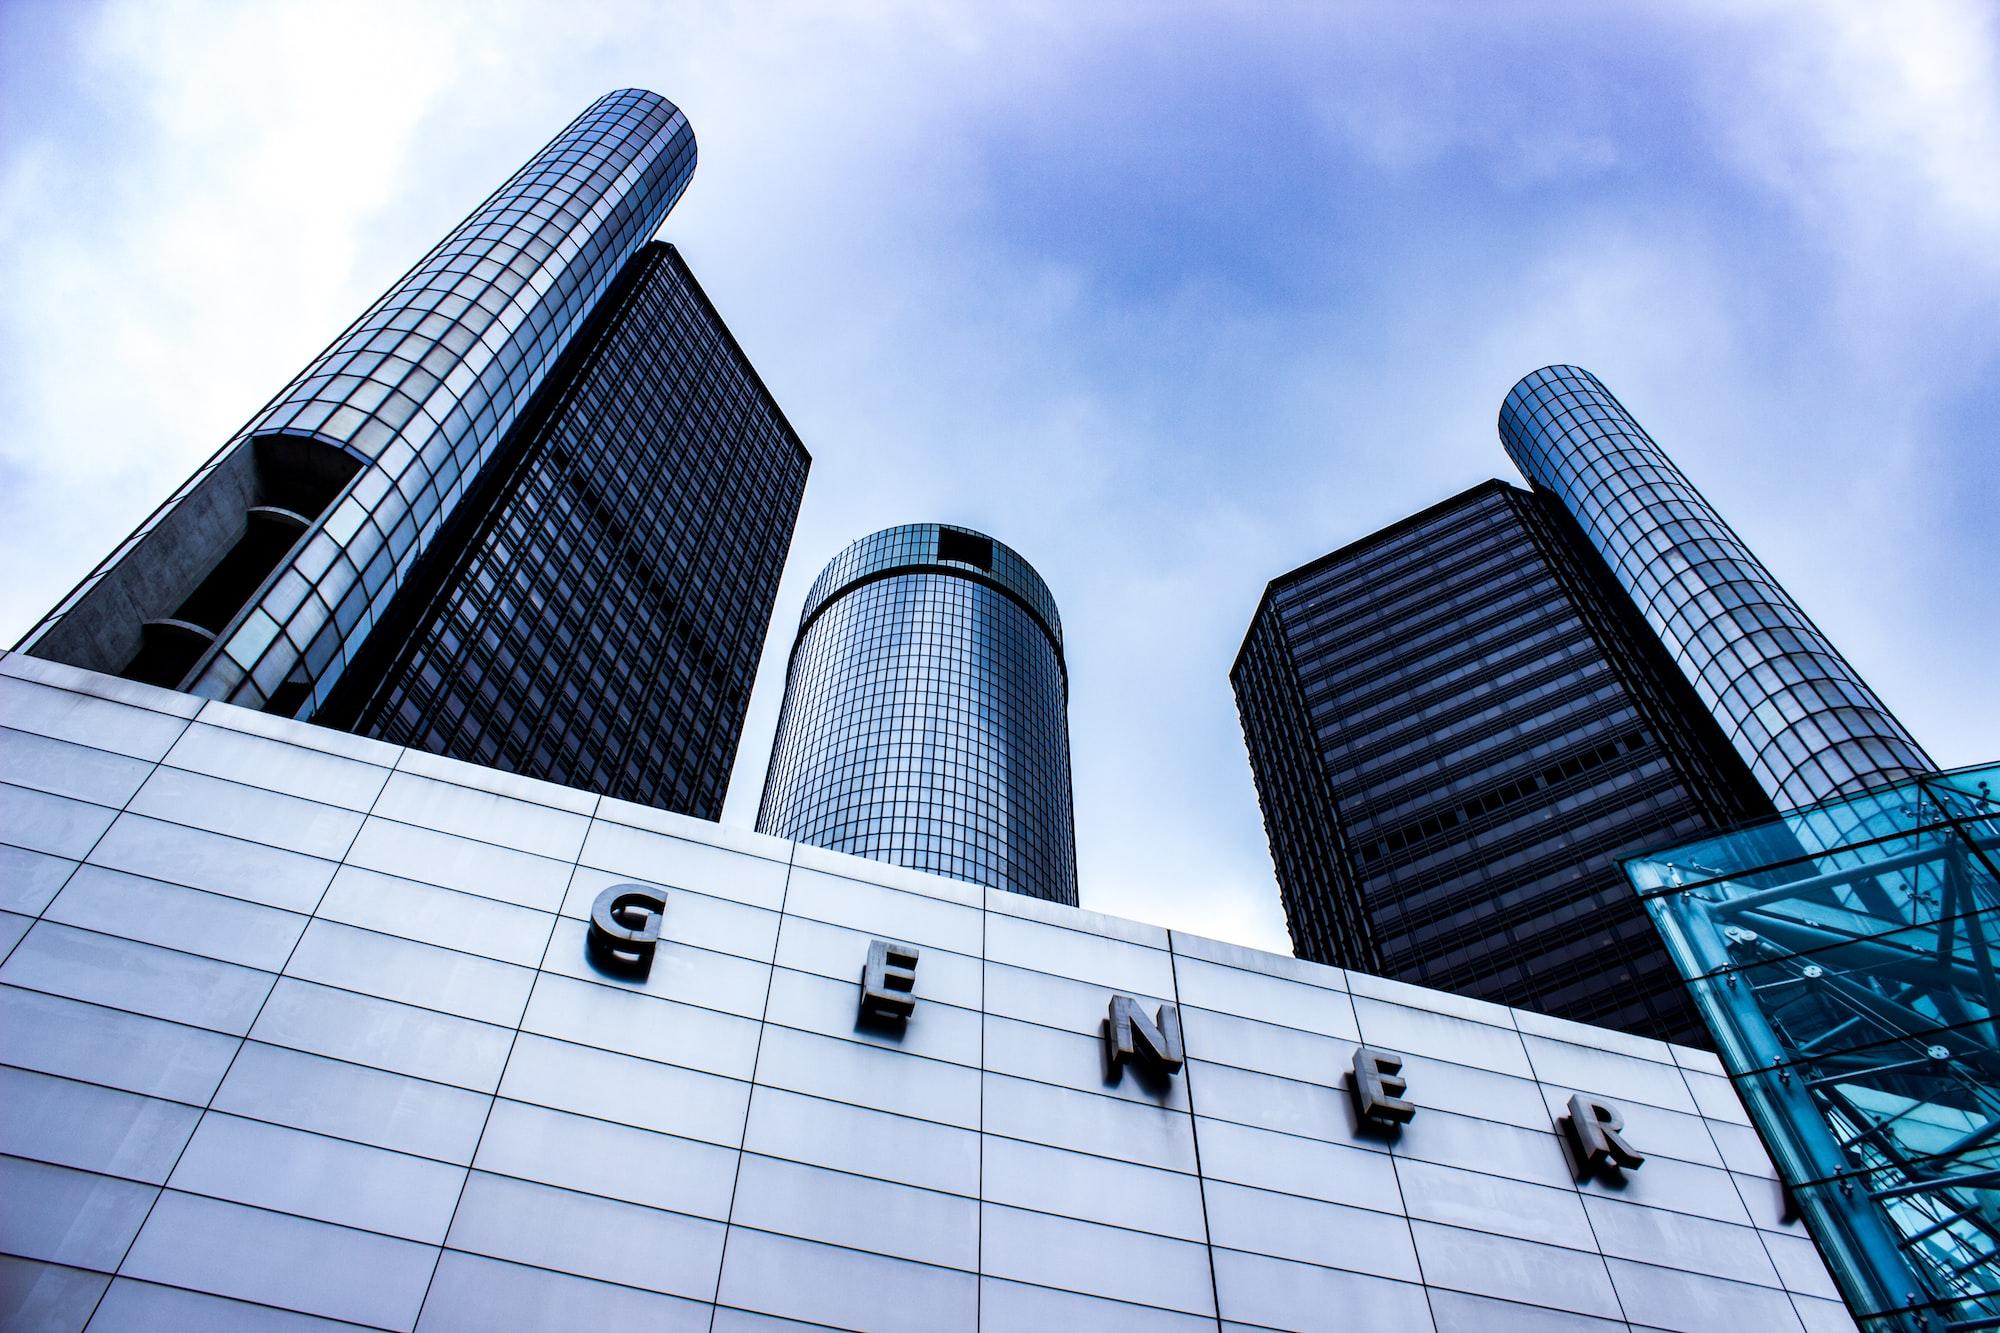 General Motors e Tata Consultancy Services anunciam nova parceria na área de engenharia de veículos